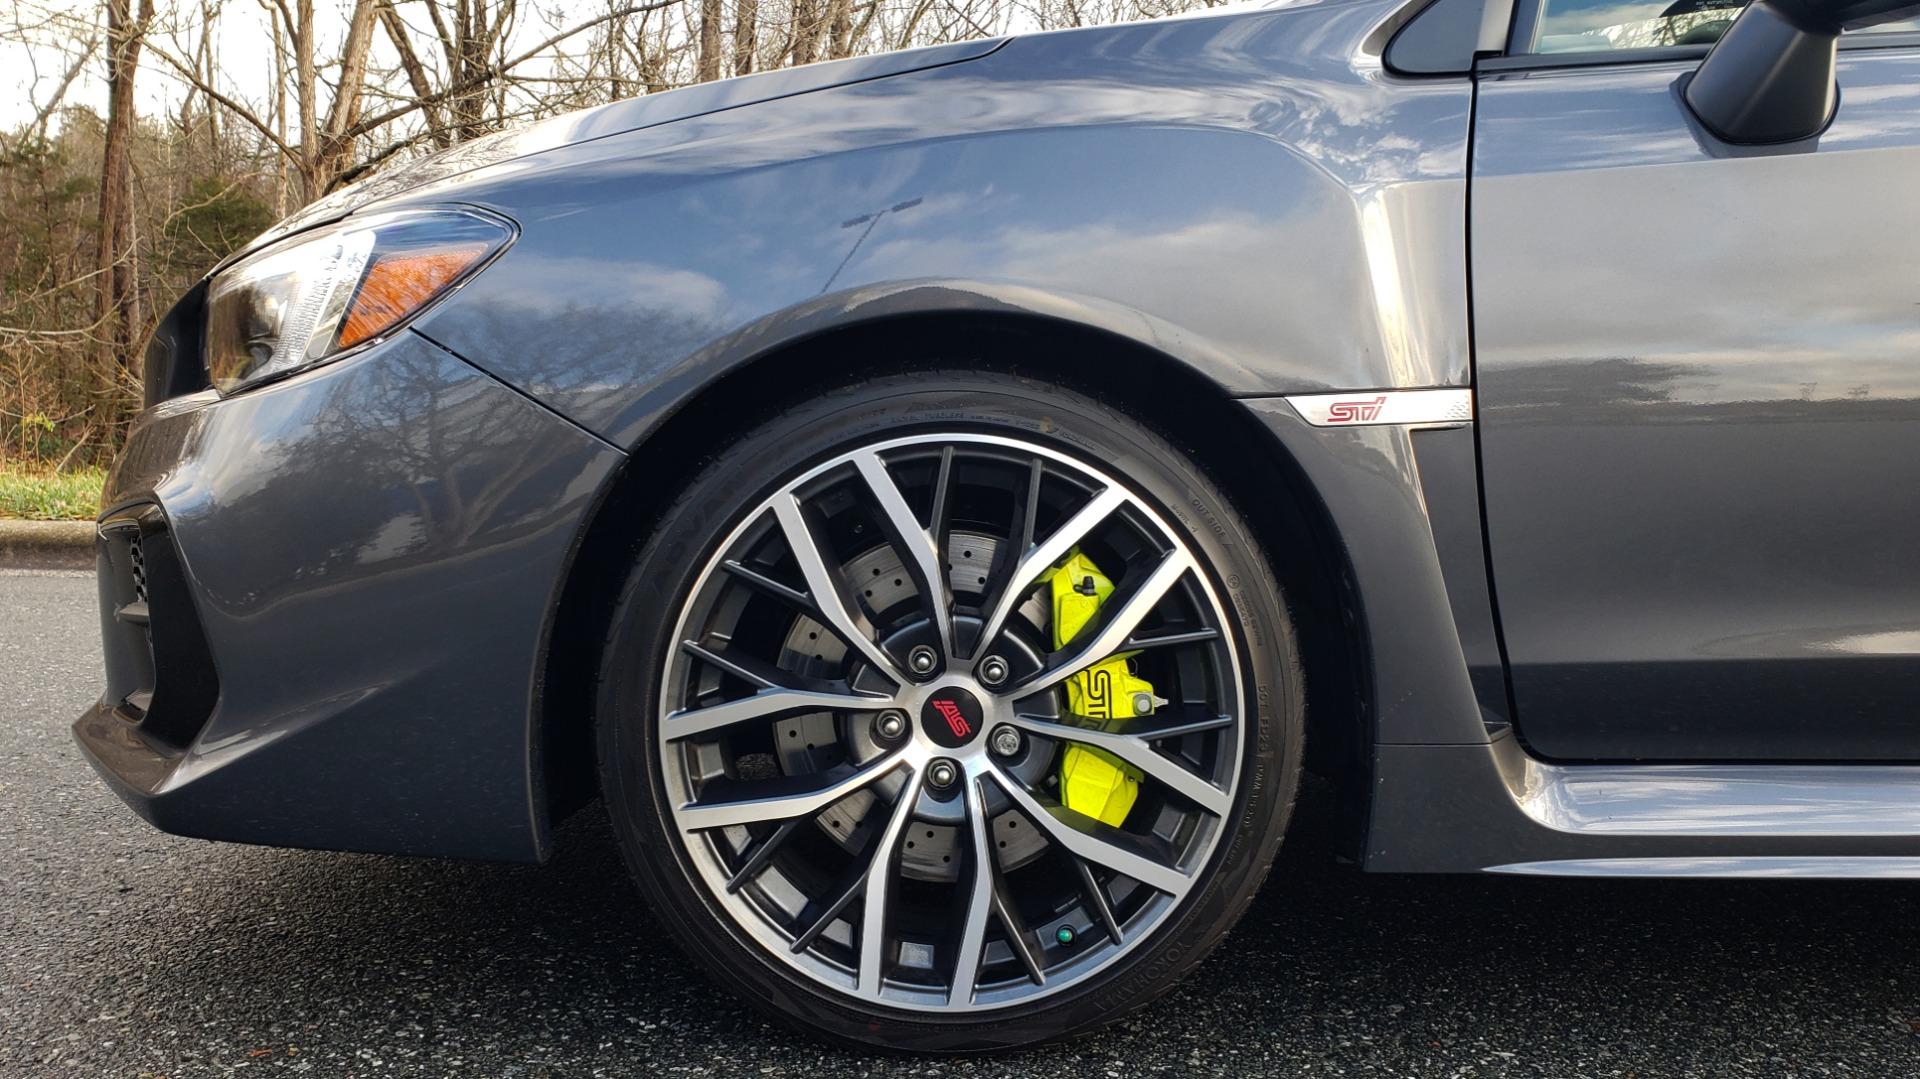 Used 2020 Subaru WRX STI 2.5L TURBO / 6-SPEED MANUAL / RECARO SEATS / REARVIEW for sale Sold at Formula Imports in Charlotte NC 28227 90